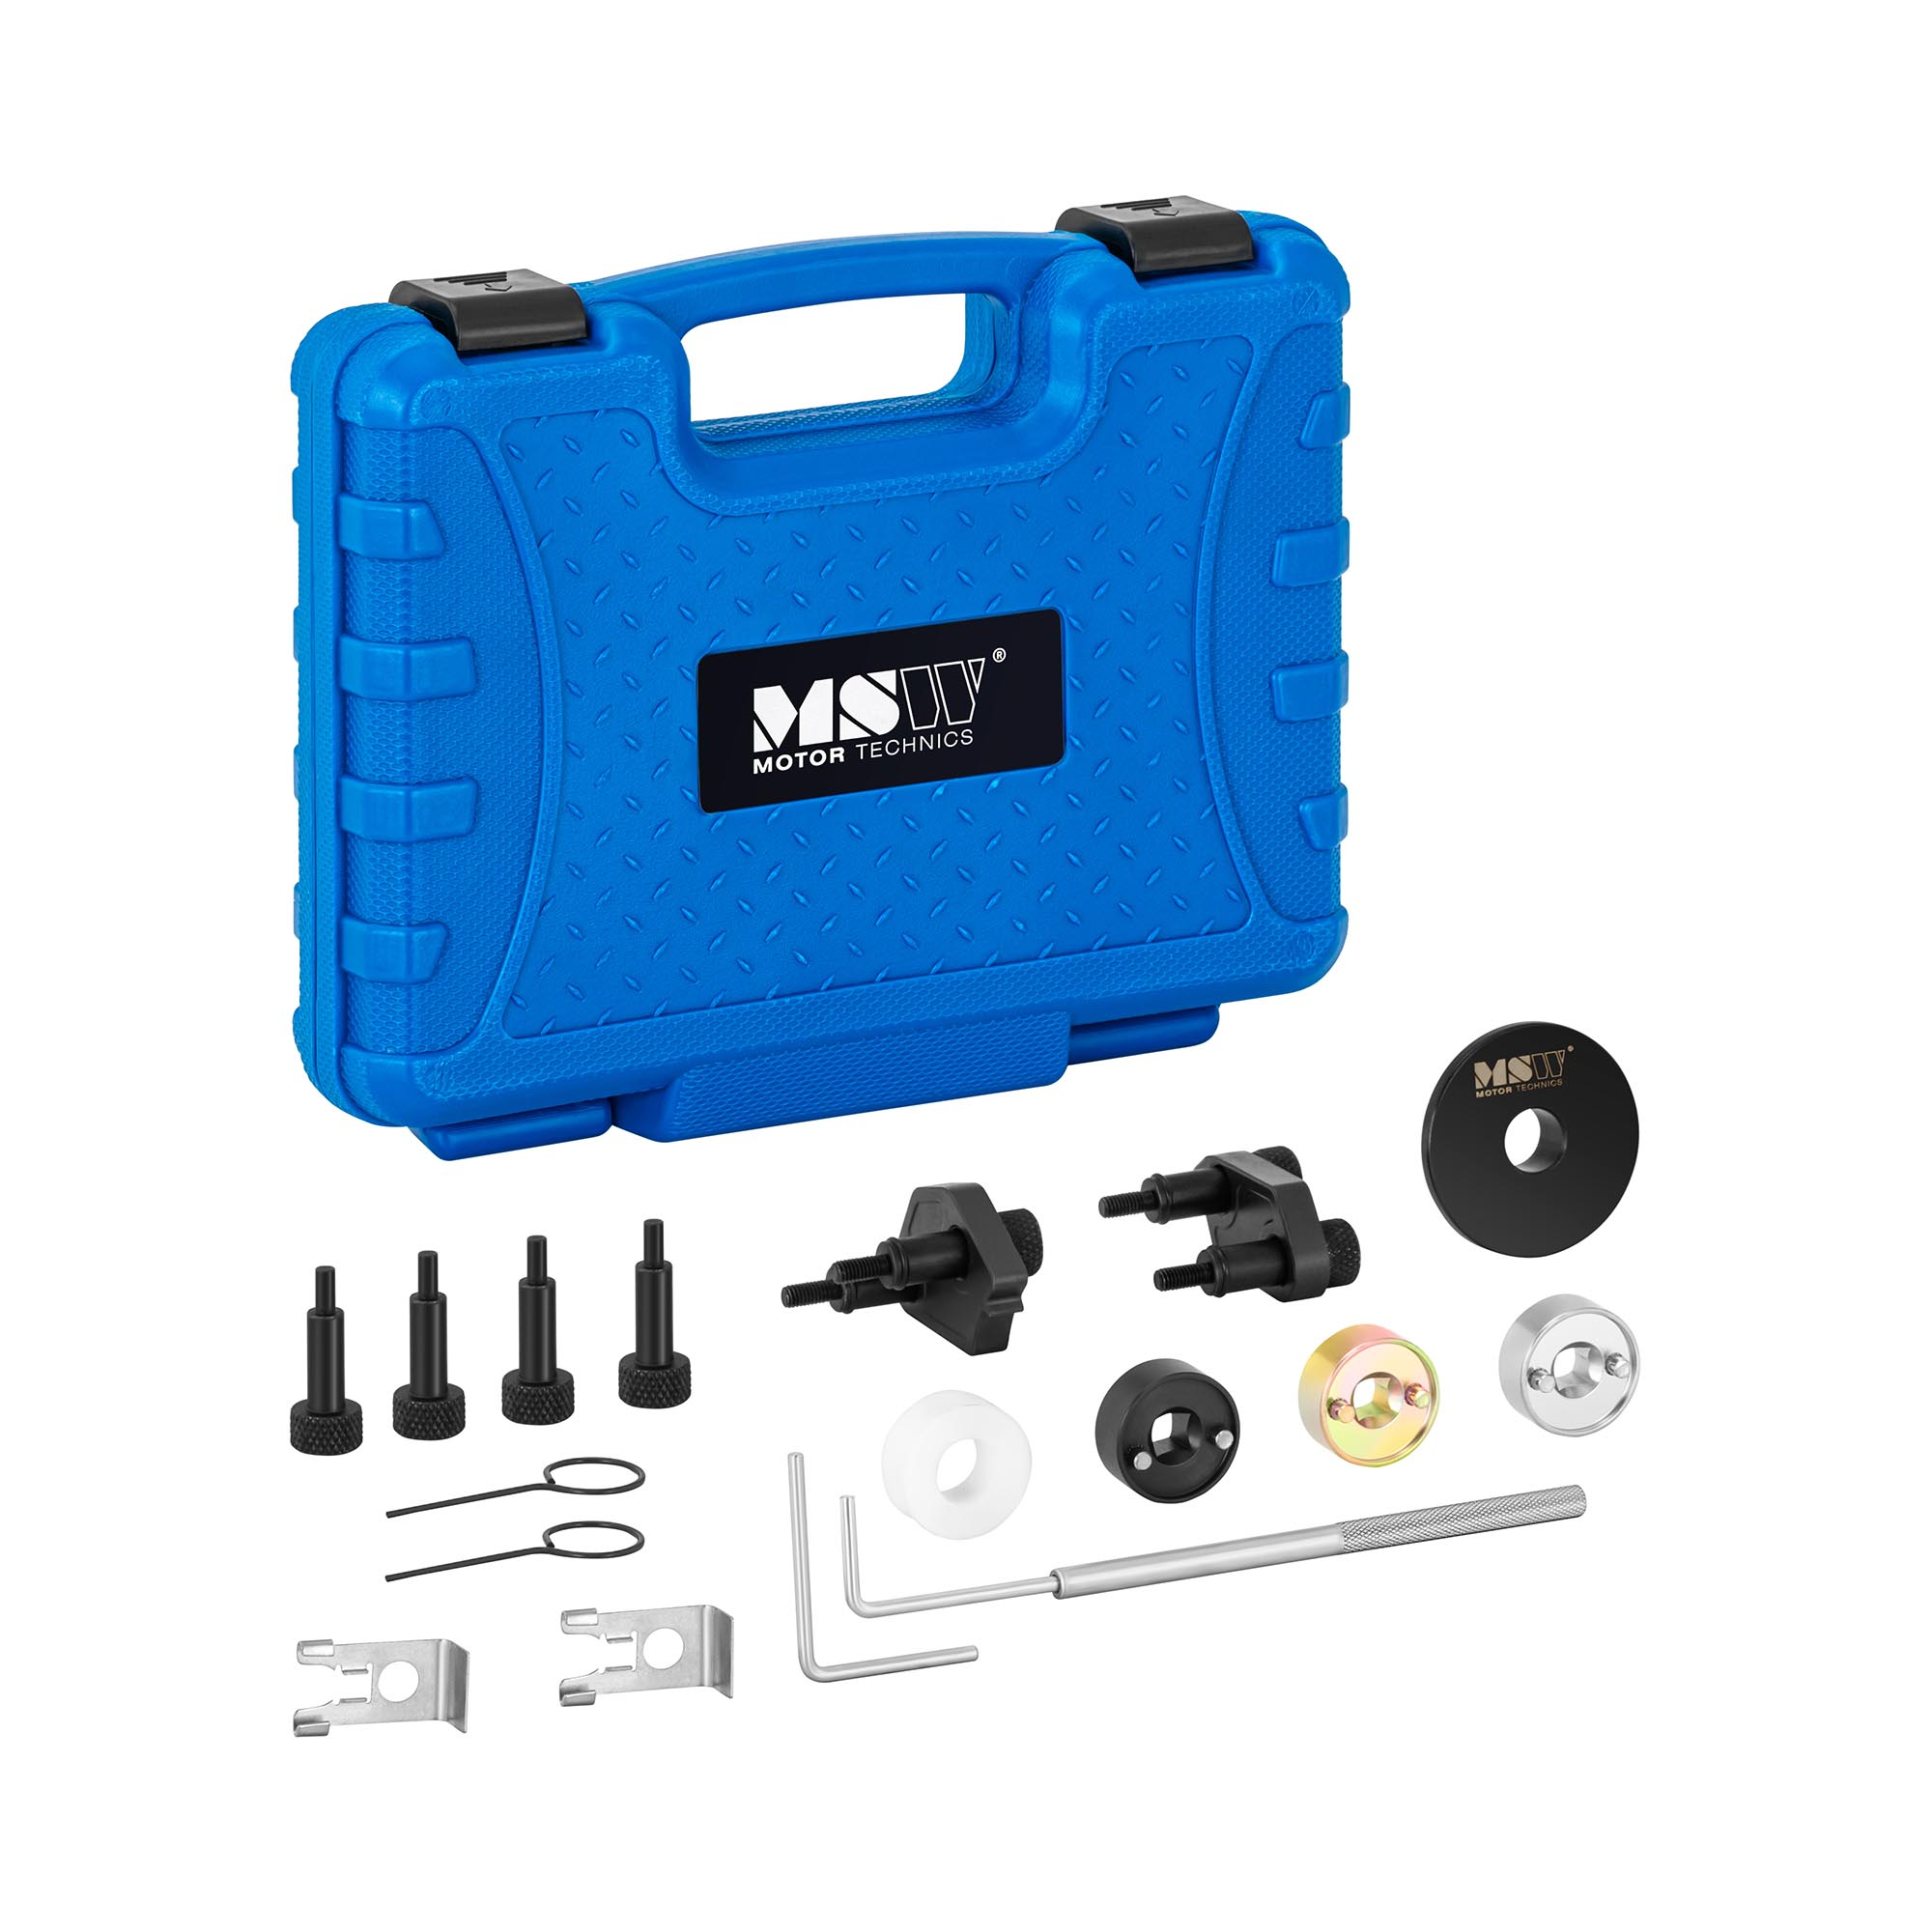 MSW Motor-Einstellwerkzeug - VW - Audi - Seat - Skoda - für VAG 1.8 TSI/TFSI, 2.0 TSI/TFSI MSW-ETT-21